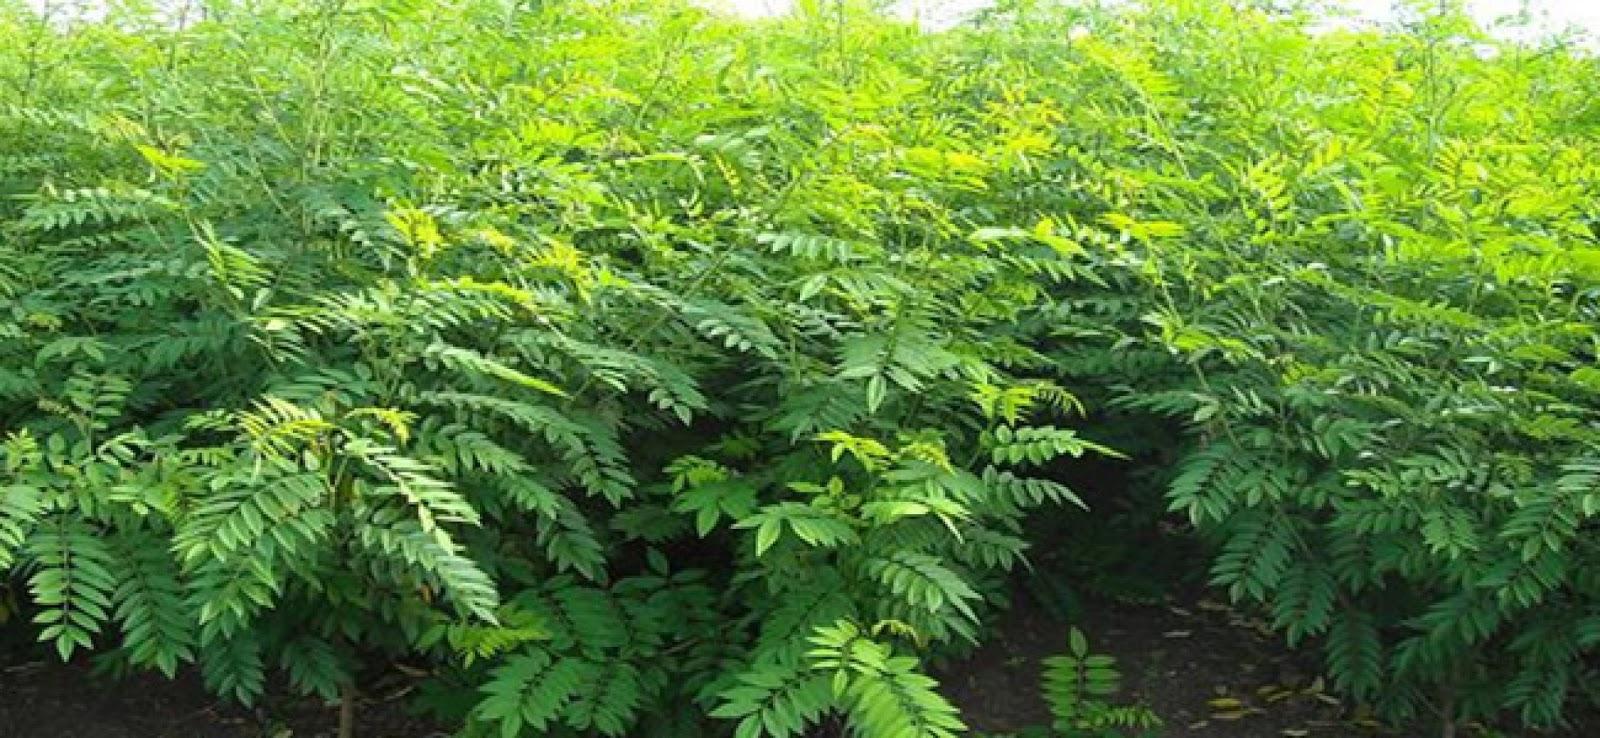 Jual Benih / Biji Pohon Indigofera